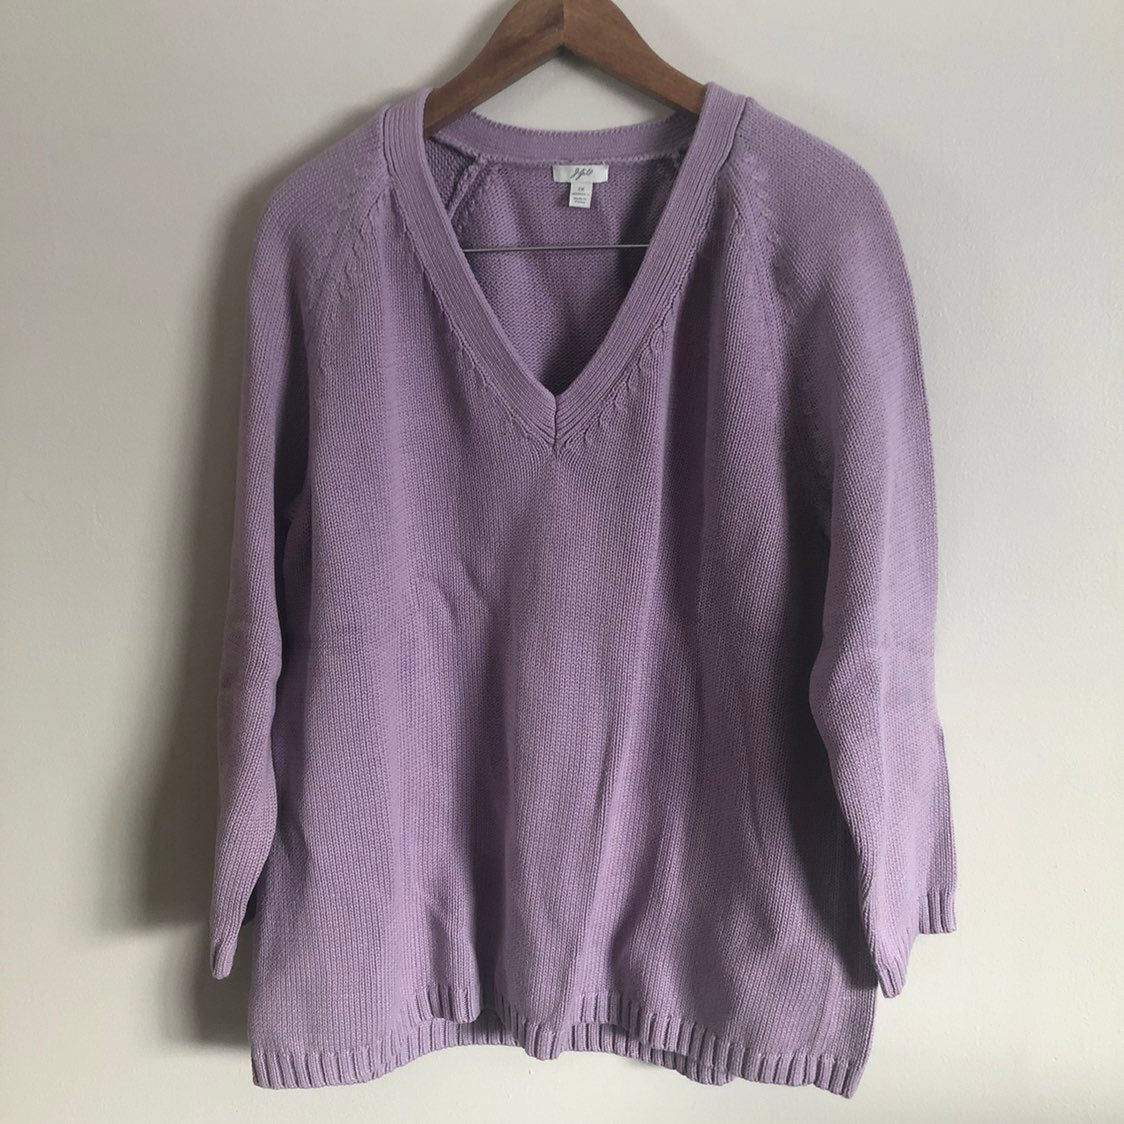 J. Jill   Purple V-Neck Knit Sweater